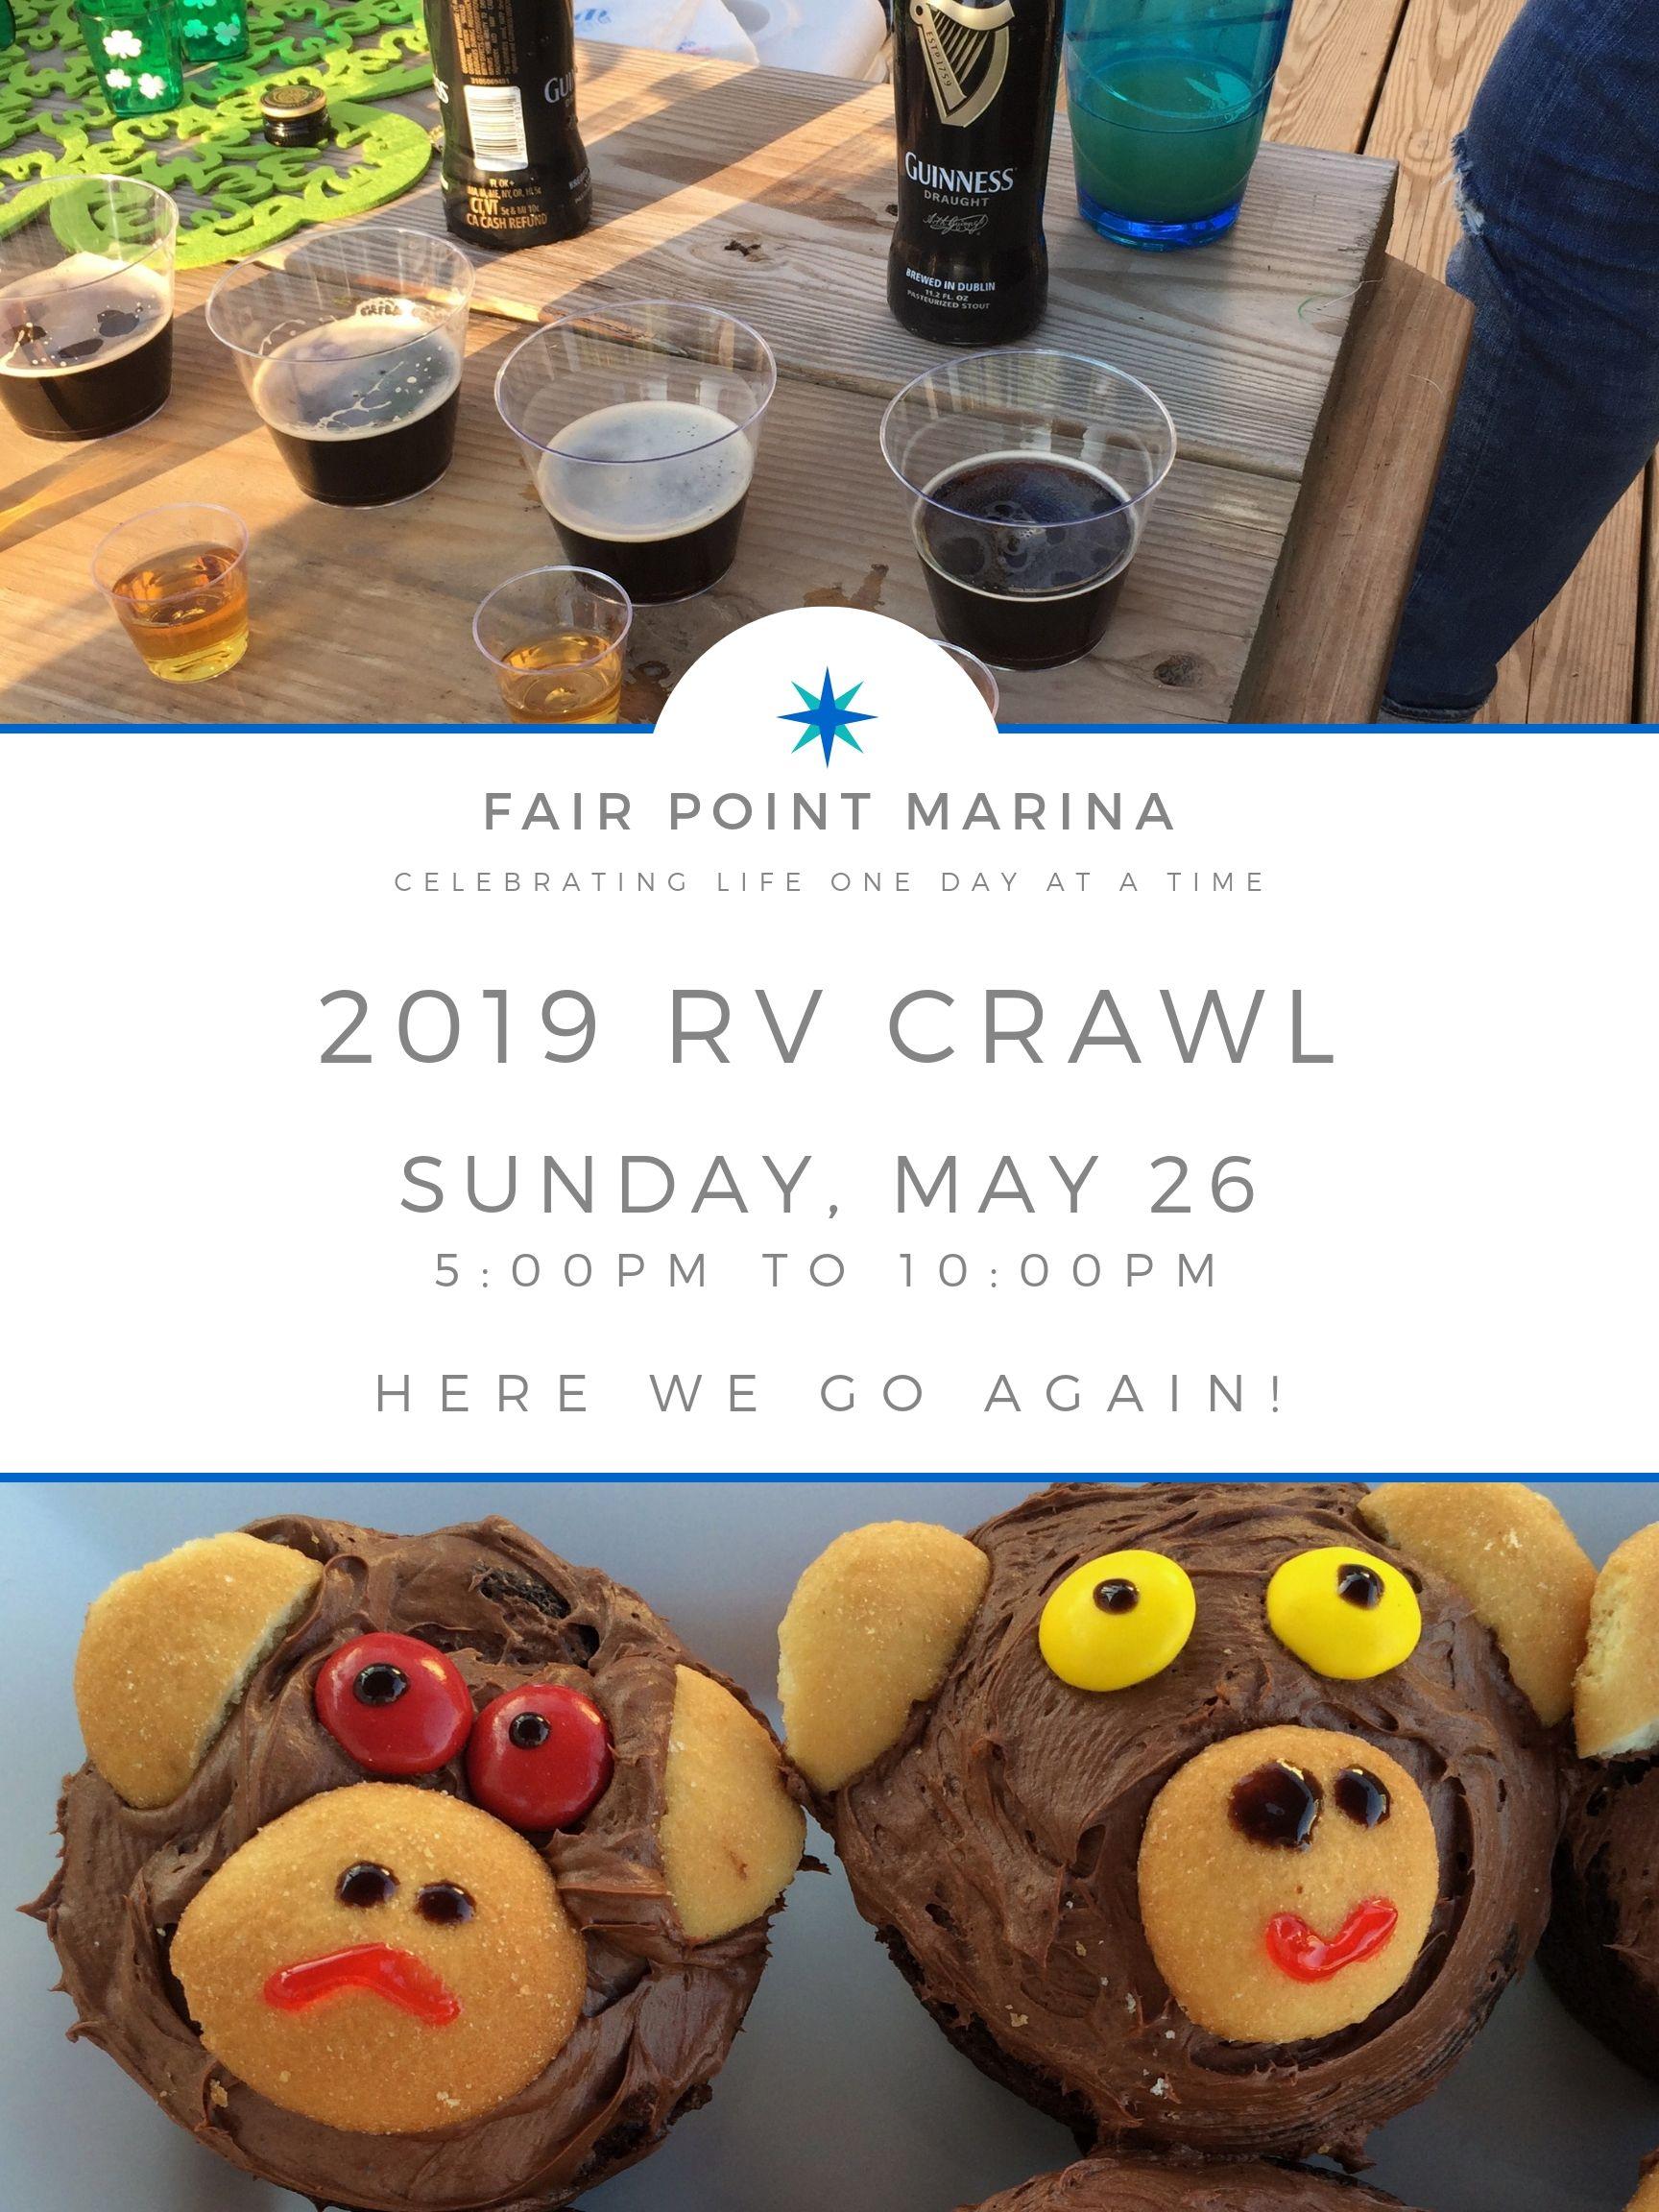 Event flyer for the Fair Point Marina 2019 RV Crawl